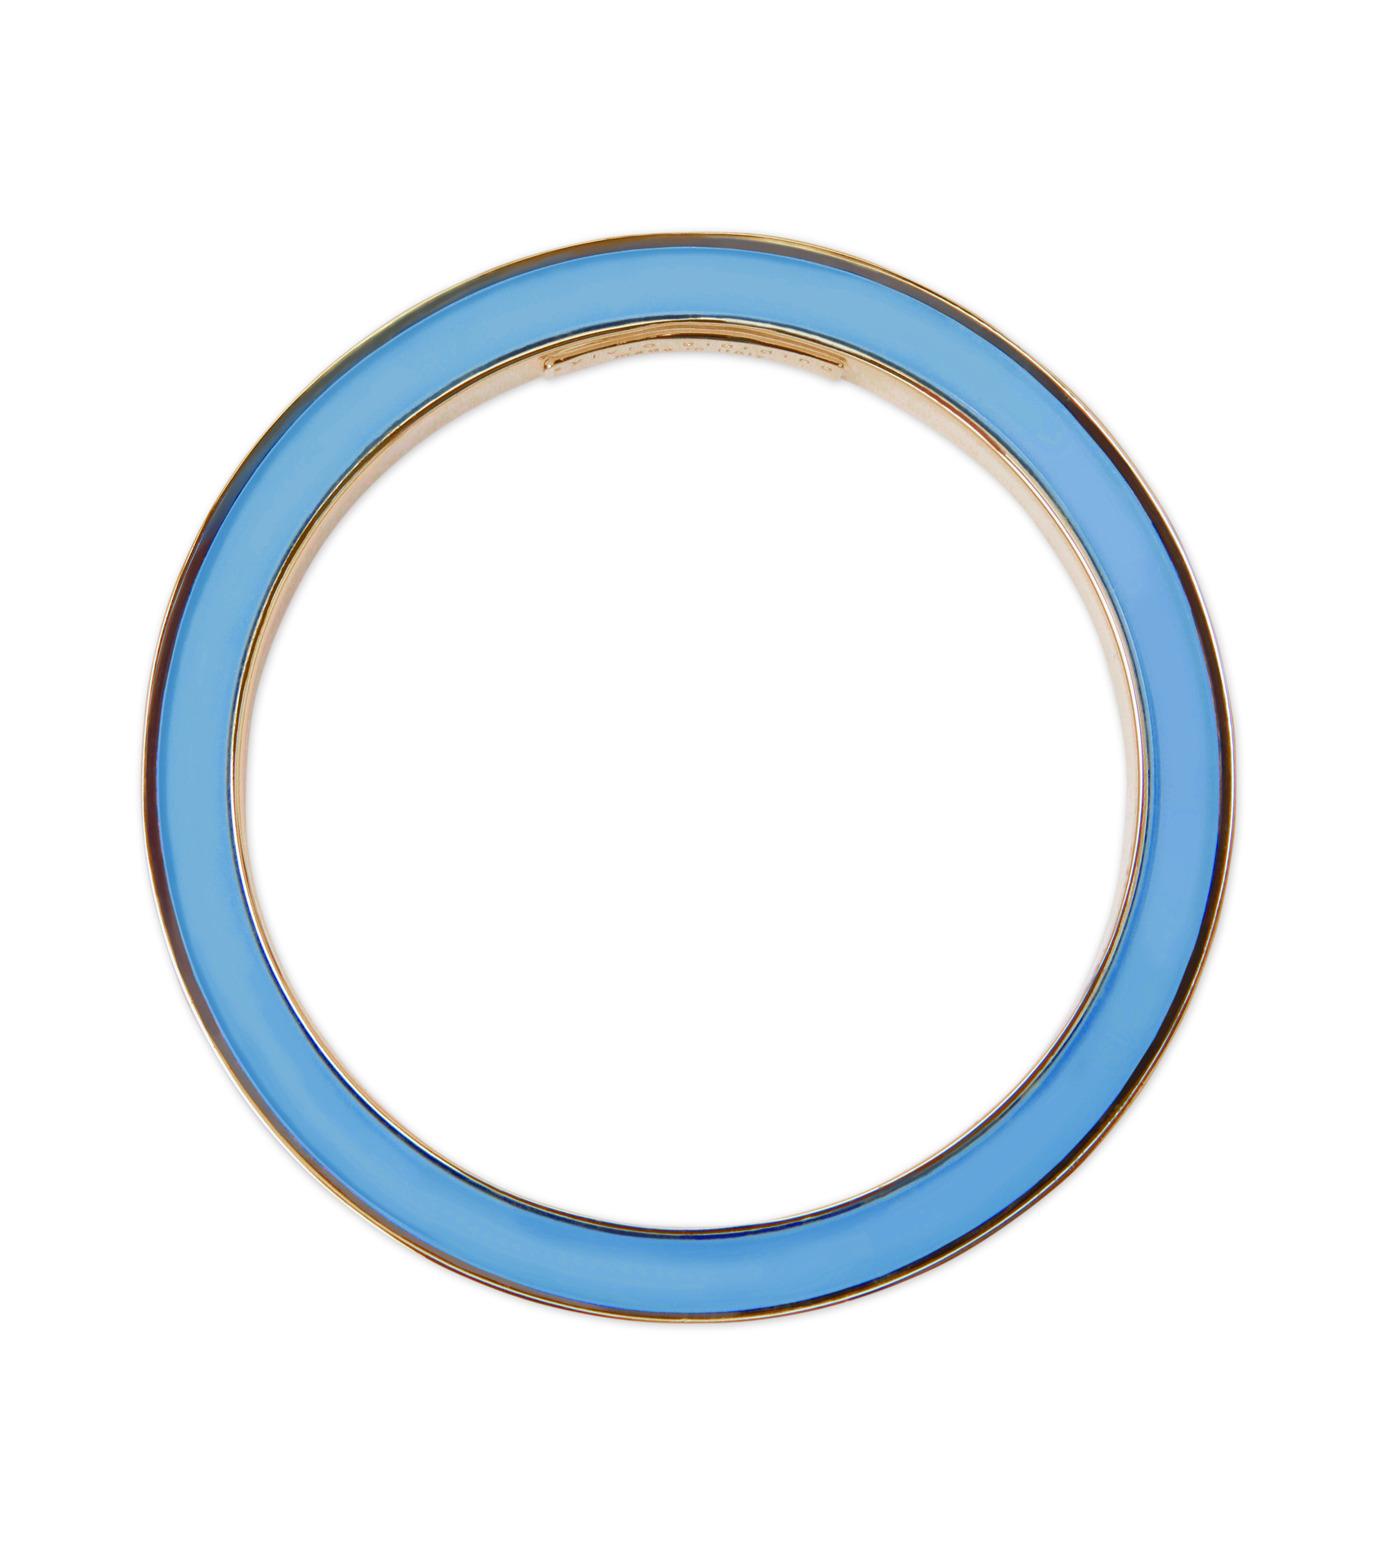 Sylvio Giardina(シルビオ・ジャルディーナ)のBracelet-LIGHT BLUE(ブレスレット/bracelet)-ART57-91 拡大詳細画像1